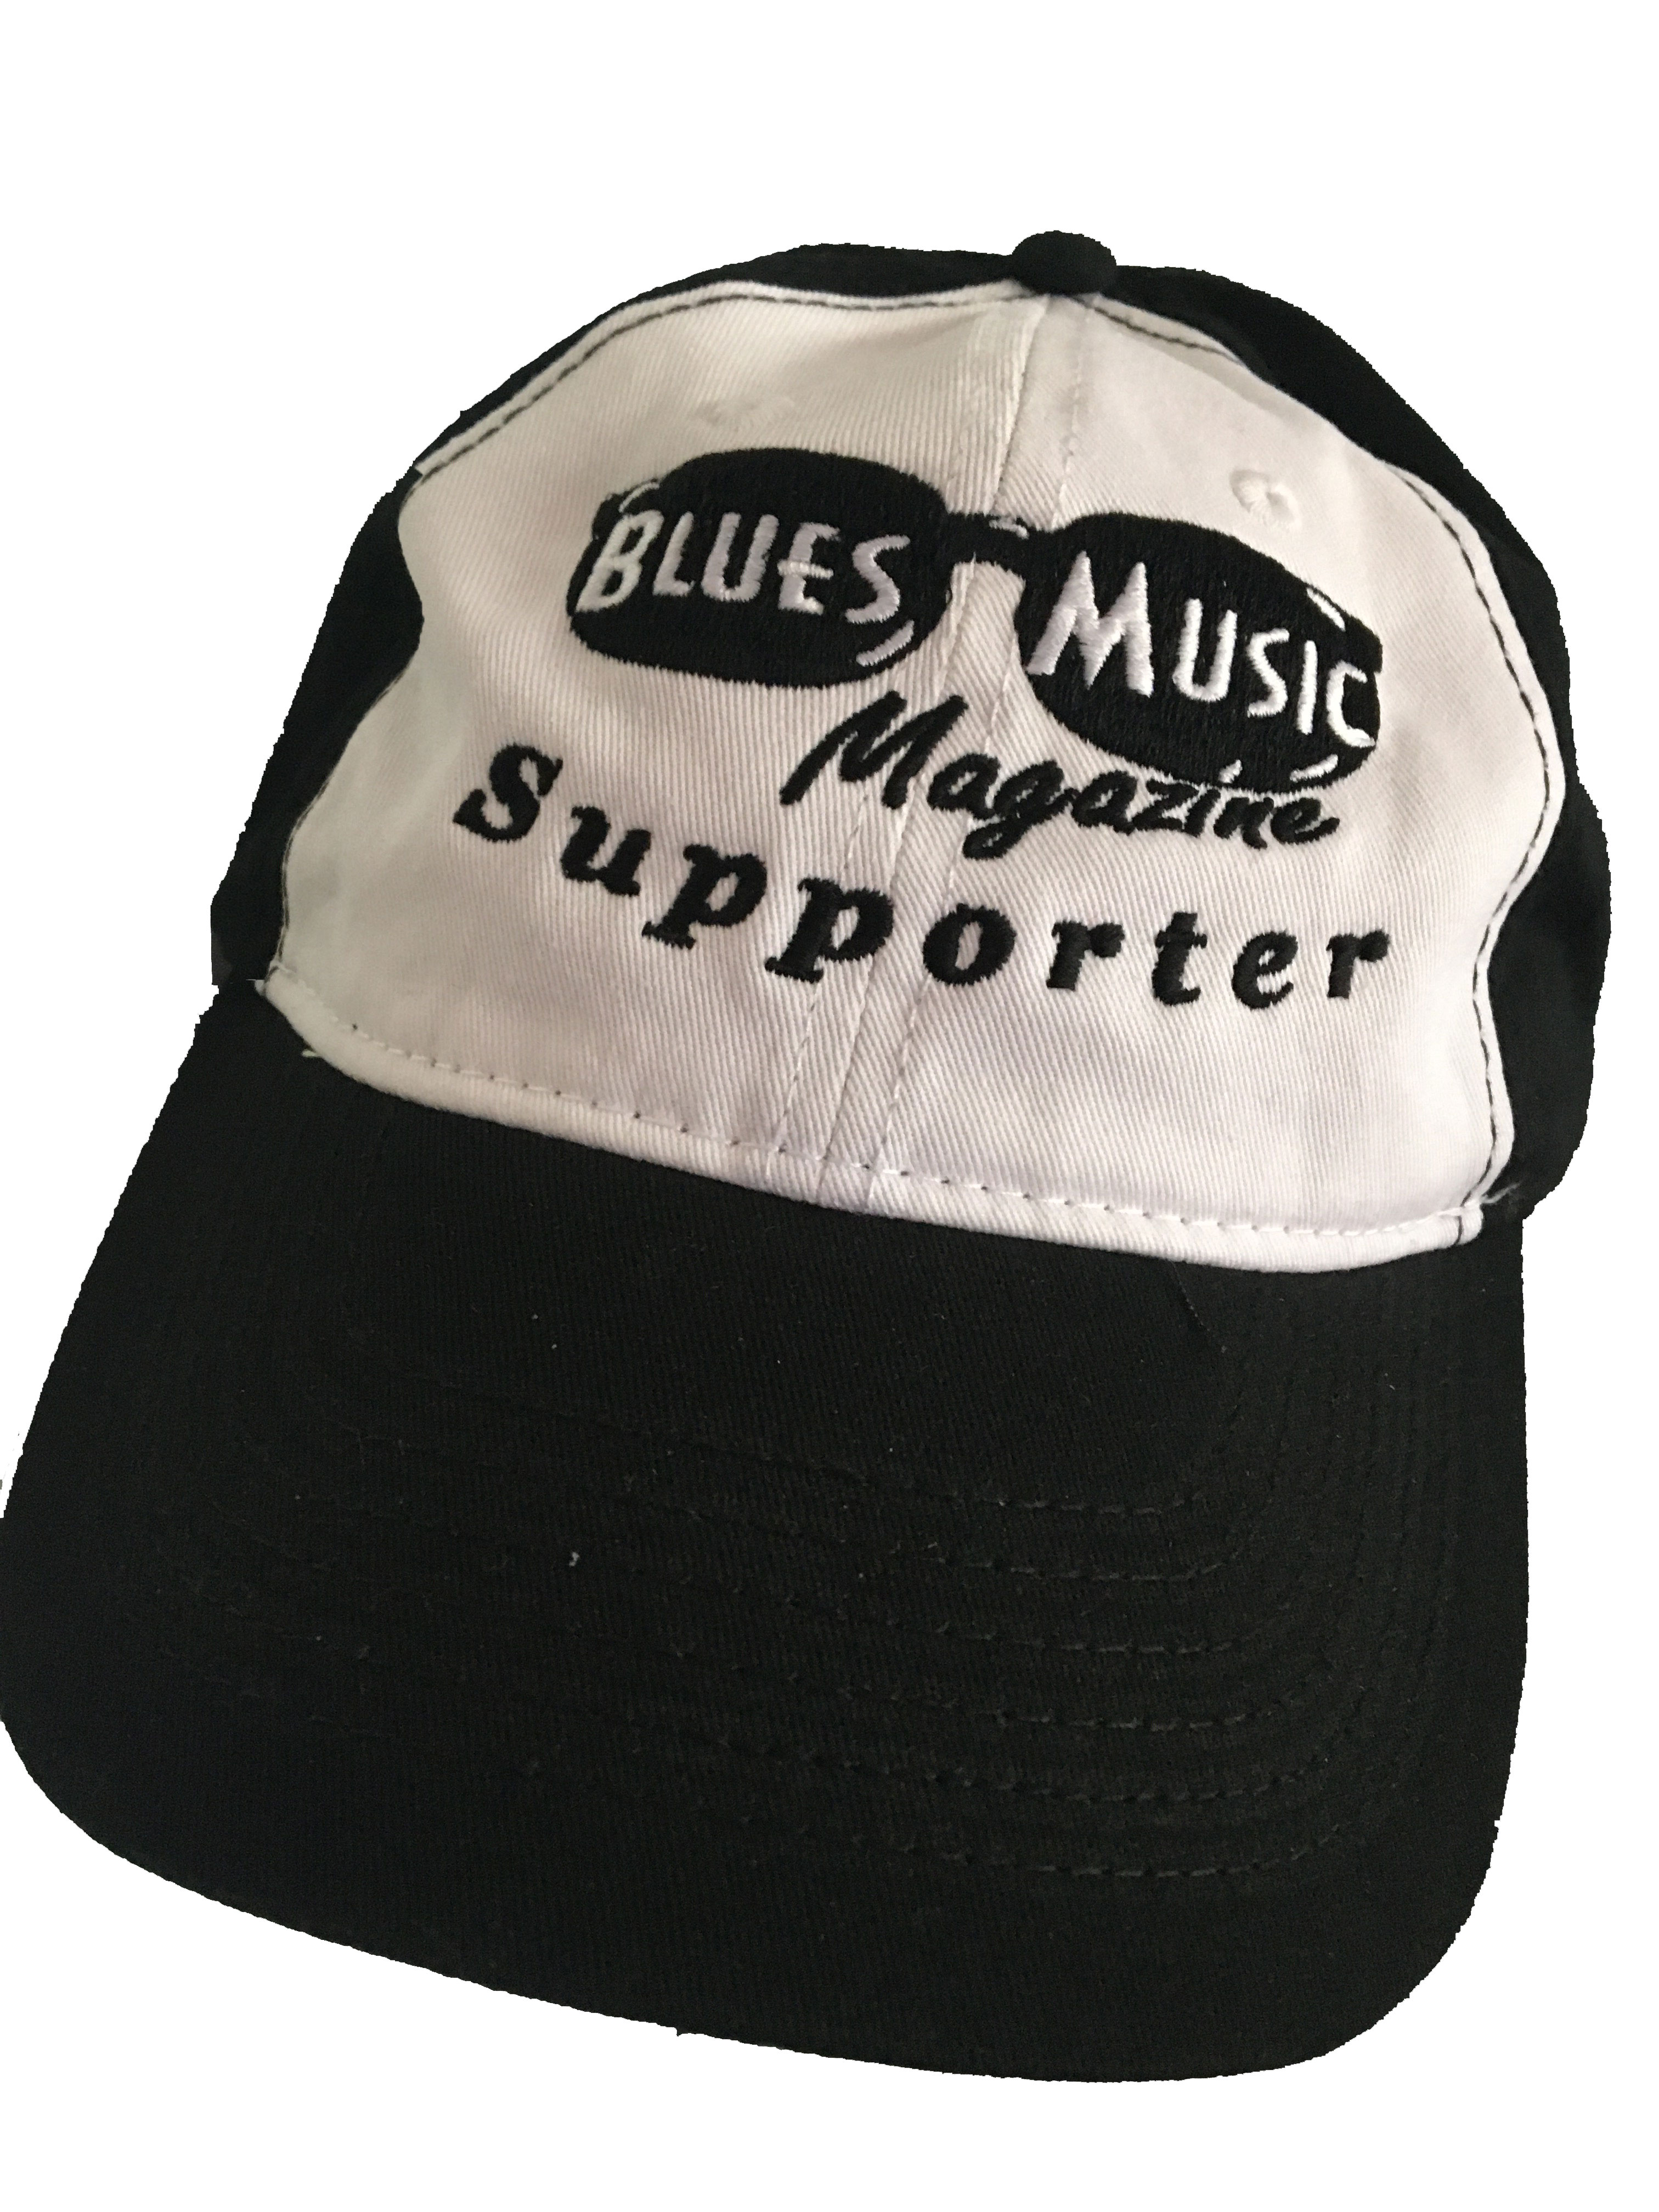 supporter-hat2.jpg